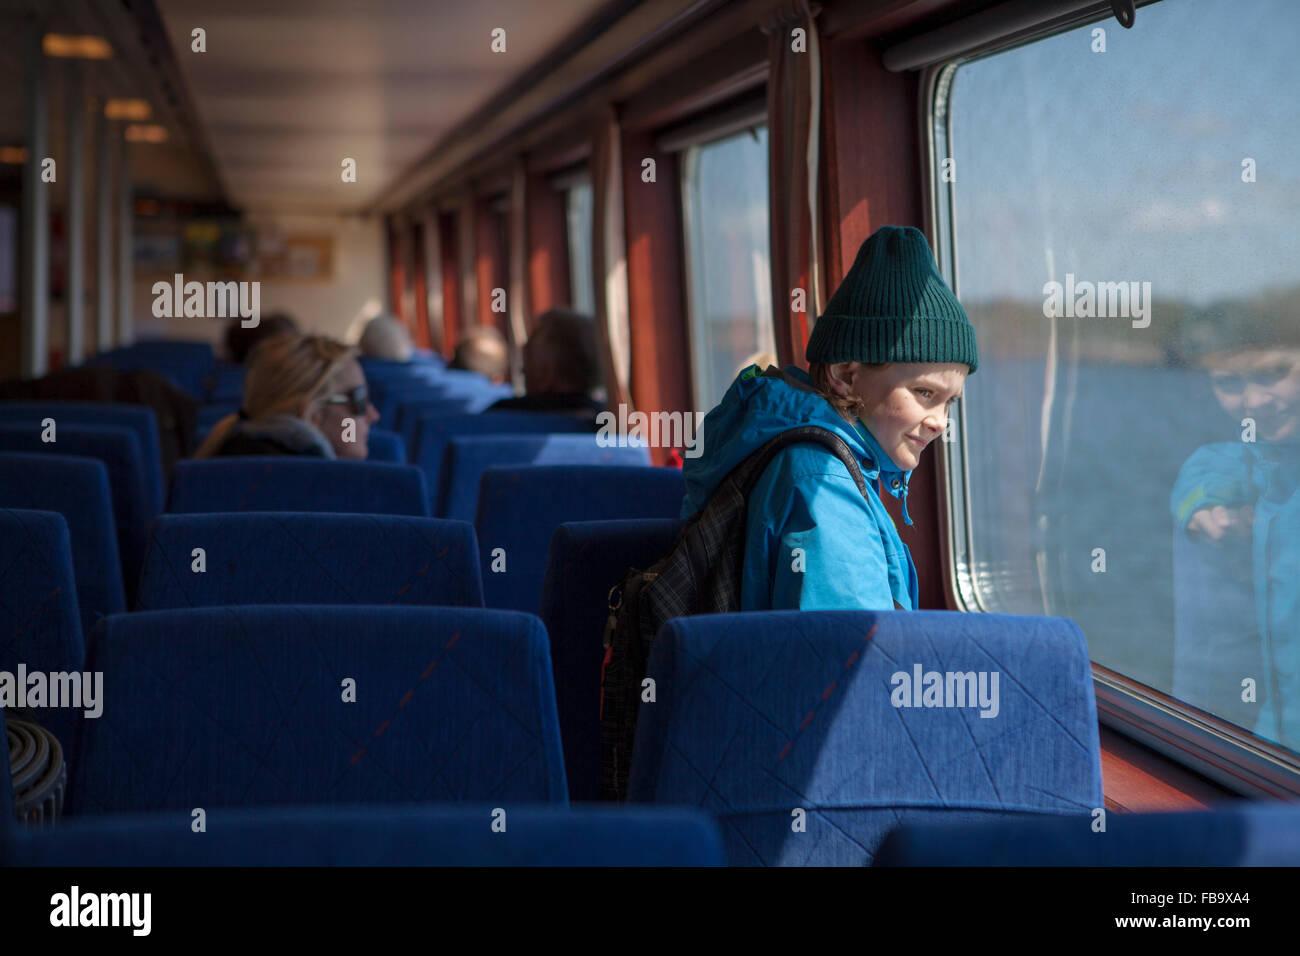 Sweden, Gothenburg Archipelago, Vastergotland, Styrso, Boy (10-11) looking through train window - Stock Image